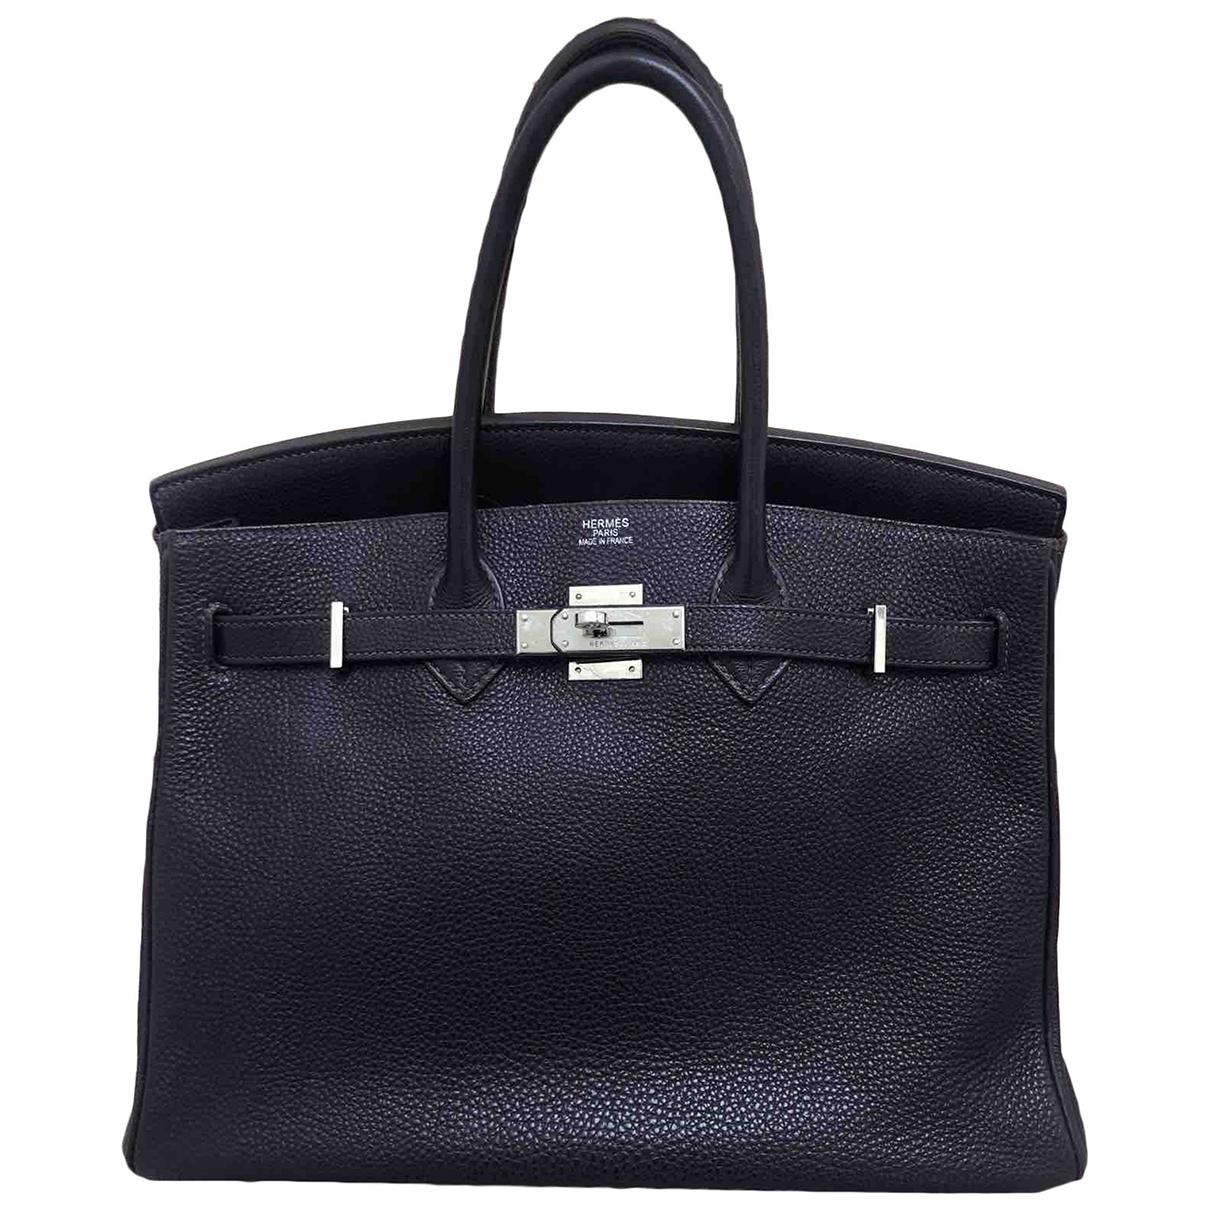 Hermes - Sac a main Birkin 35 pour femme en cuir - violet